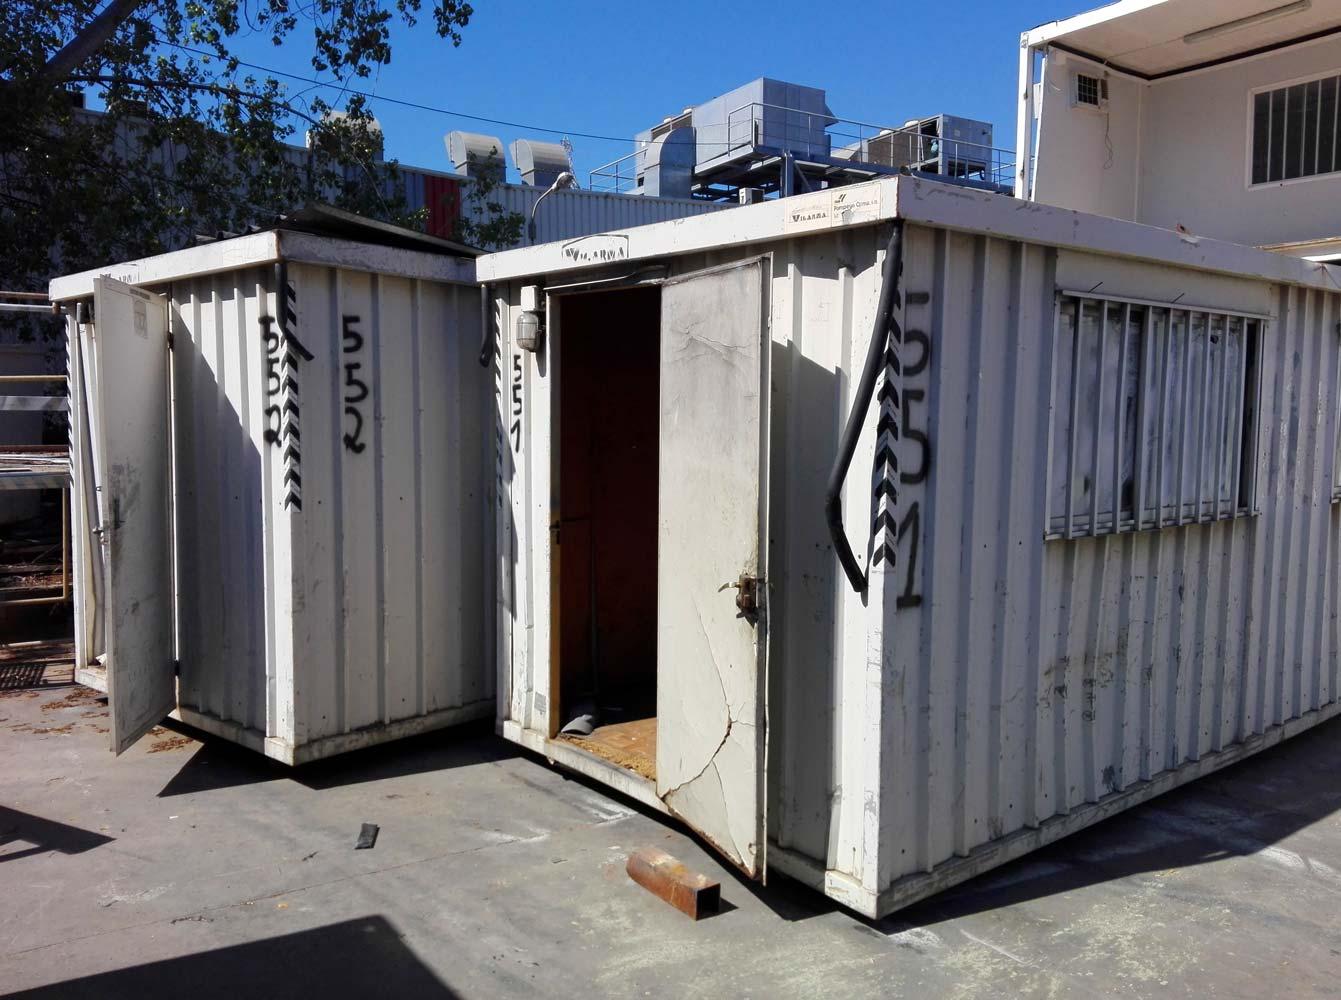 Contenedor oficina blanco sin rehabilitar venta desde - Contenedor maritimo segunda mano ...